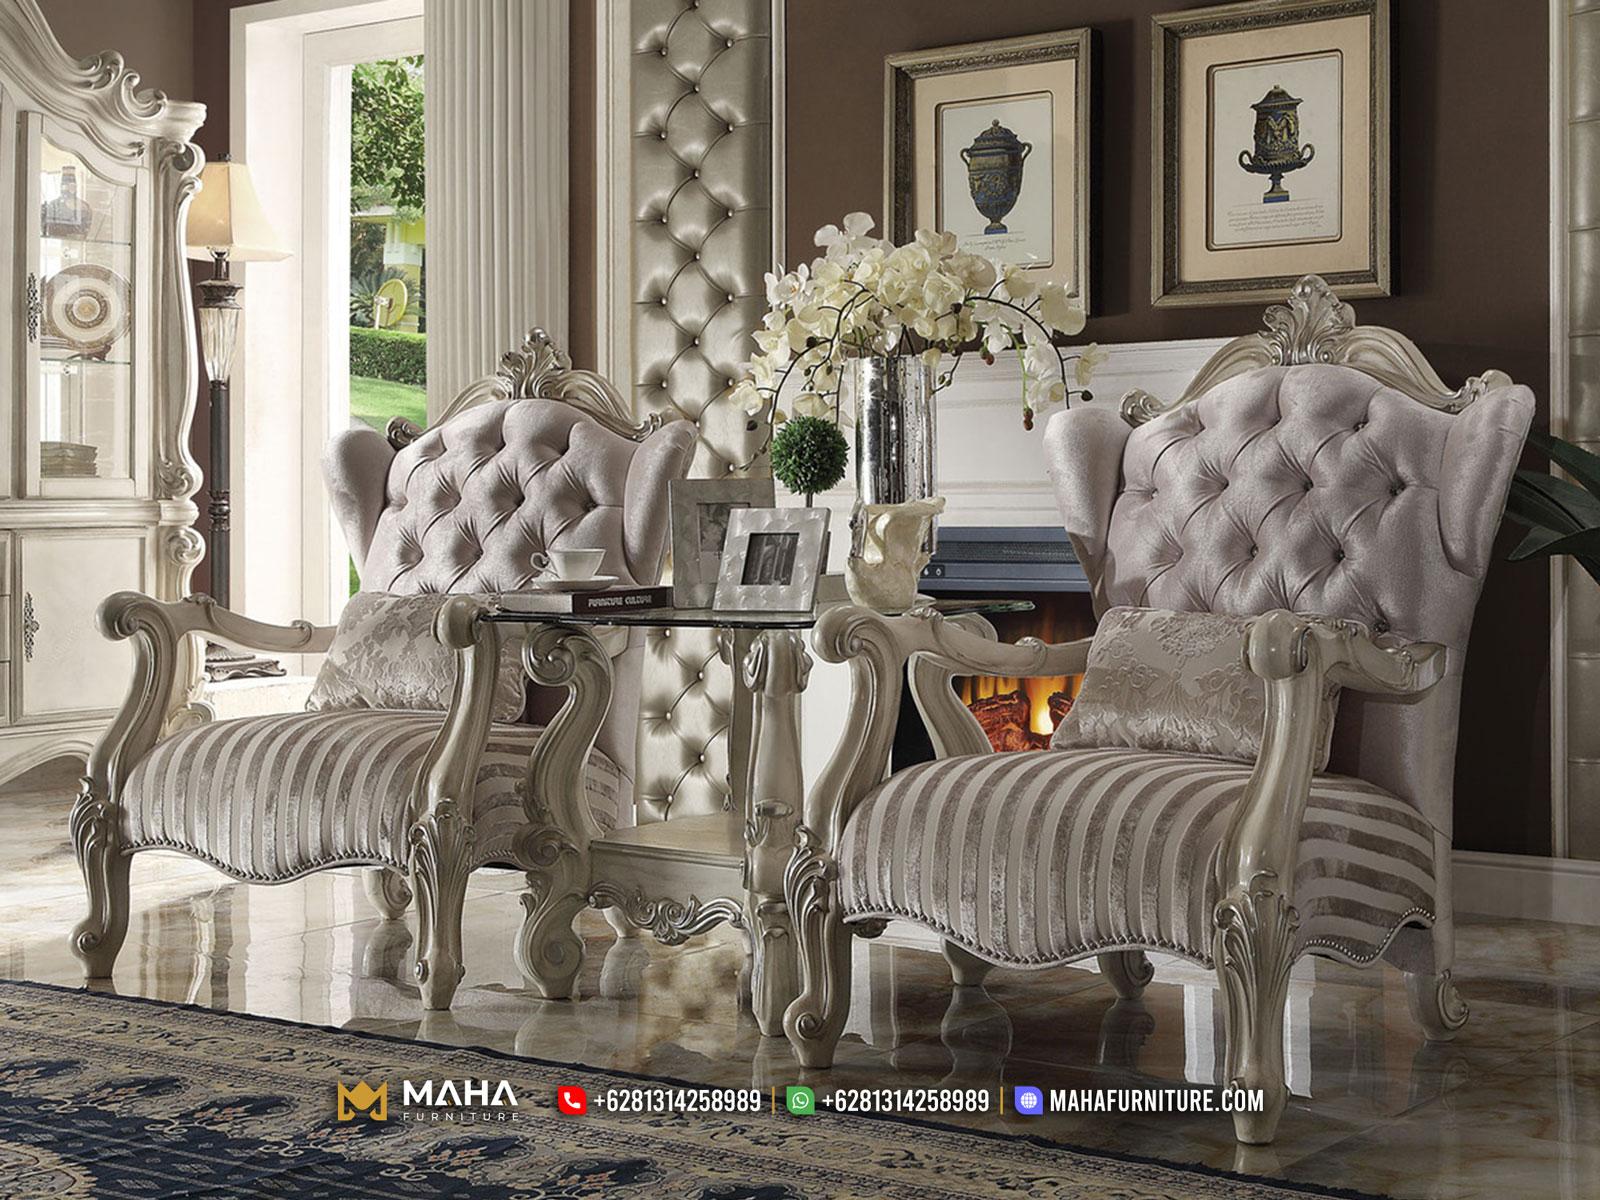 Terbaru Model Sofa Mewah Gaya Klasik White Doff Sparkling MF85